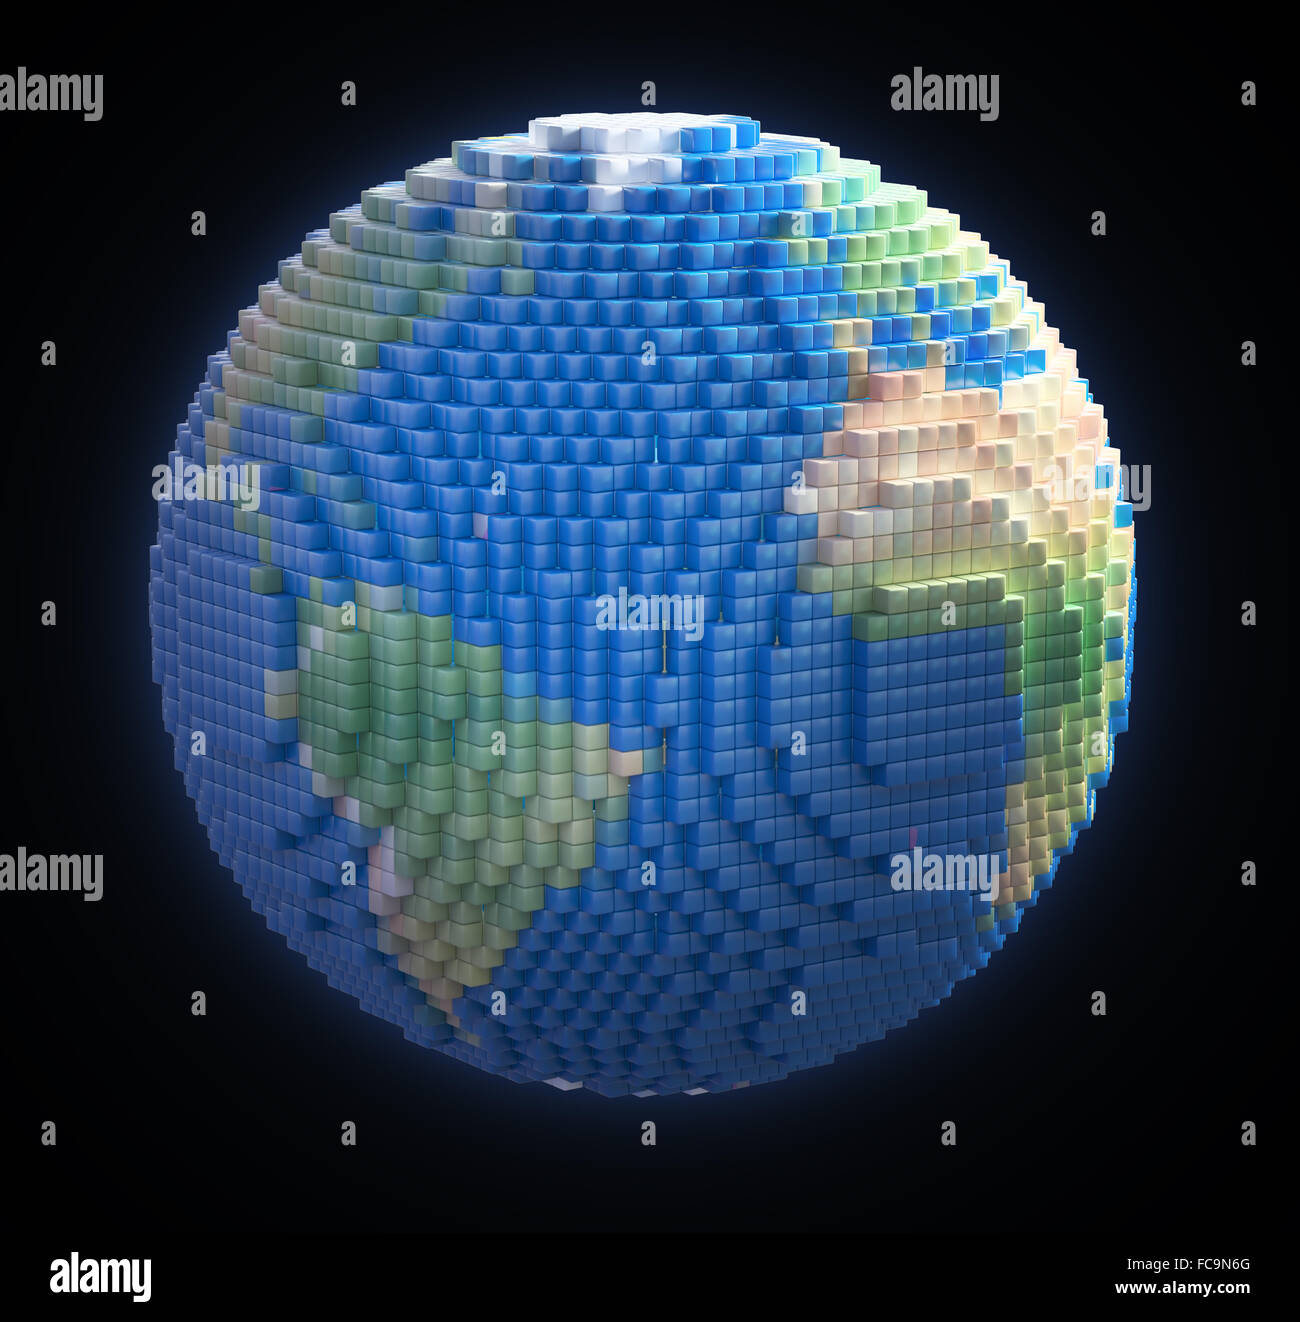 Globo terráqueo de vóxel cubos 3d Imagen De Stock